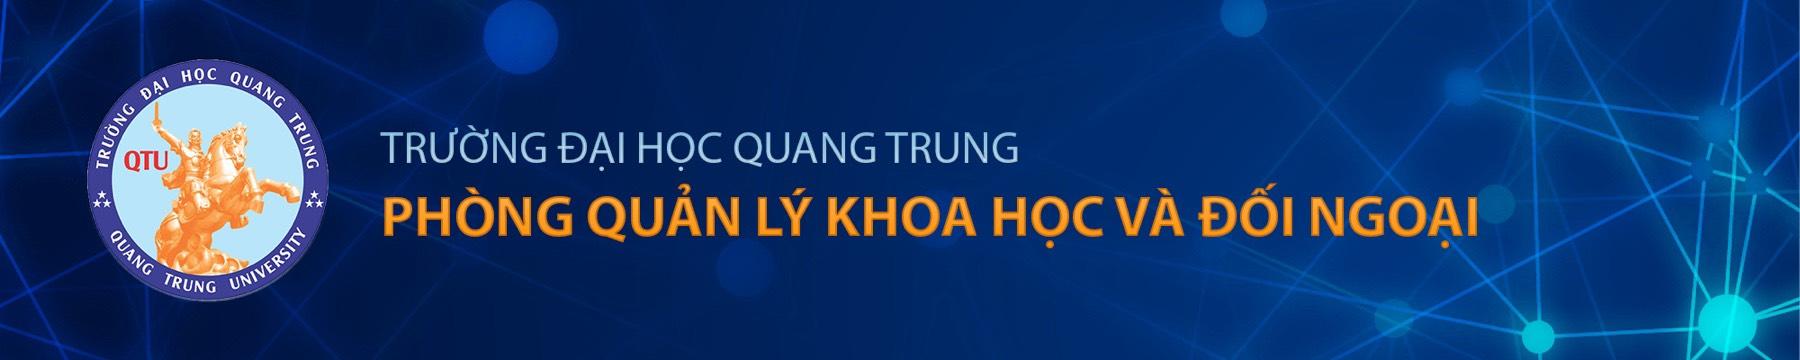 Bannerphongkhoahoc